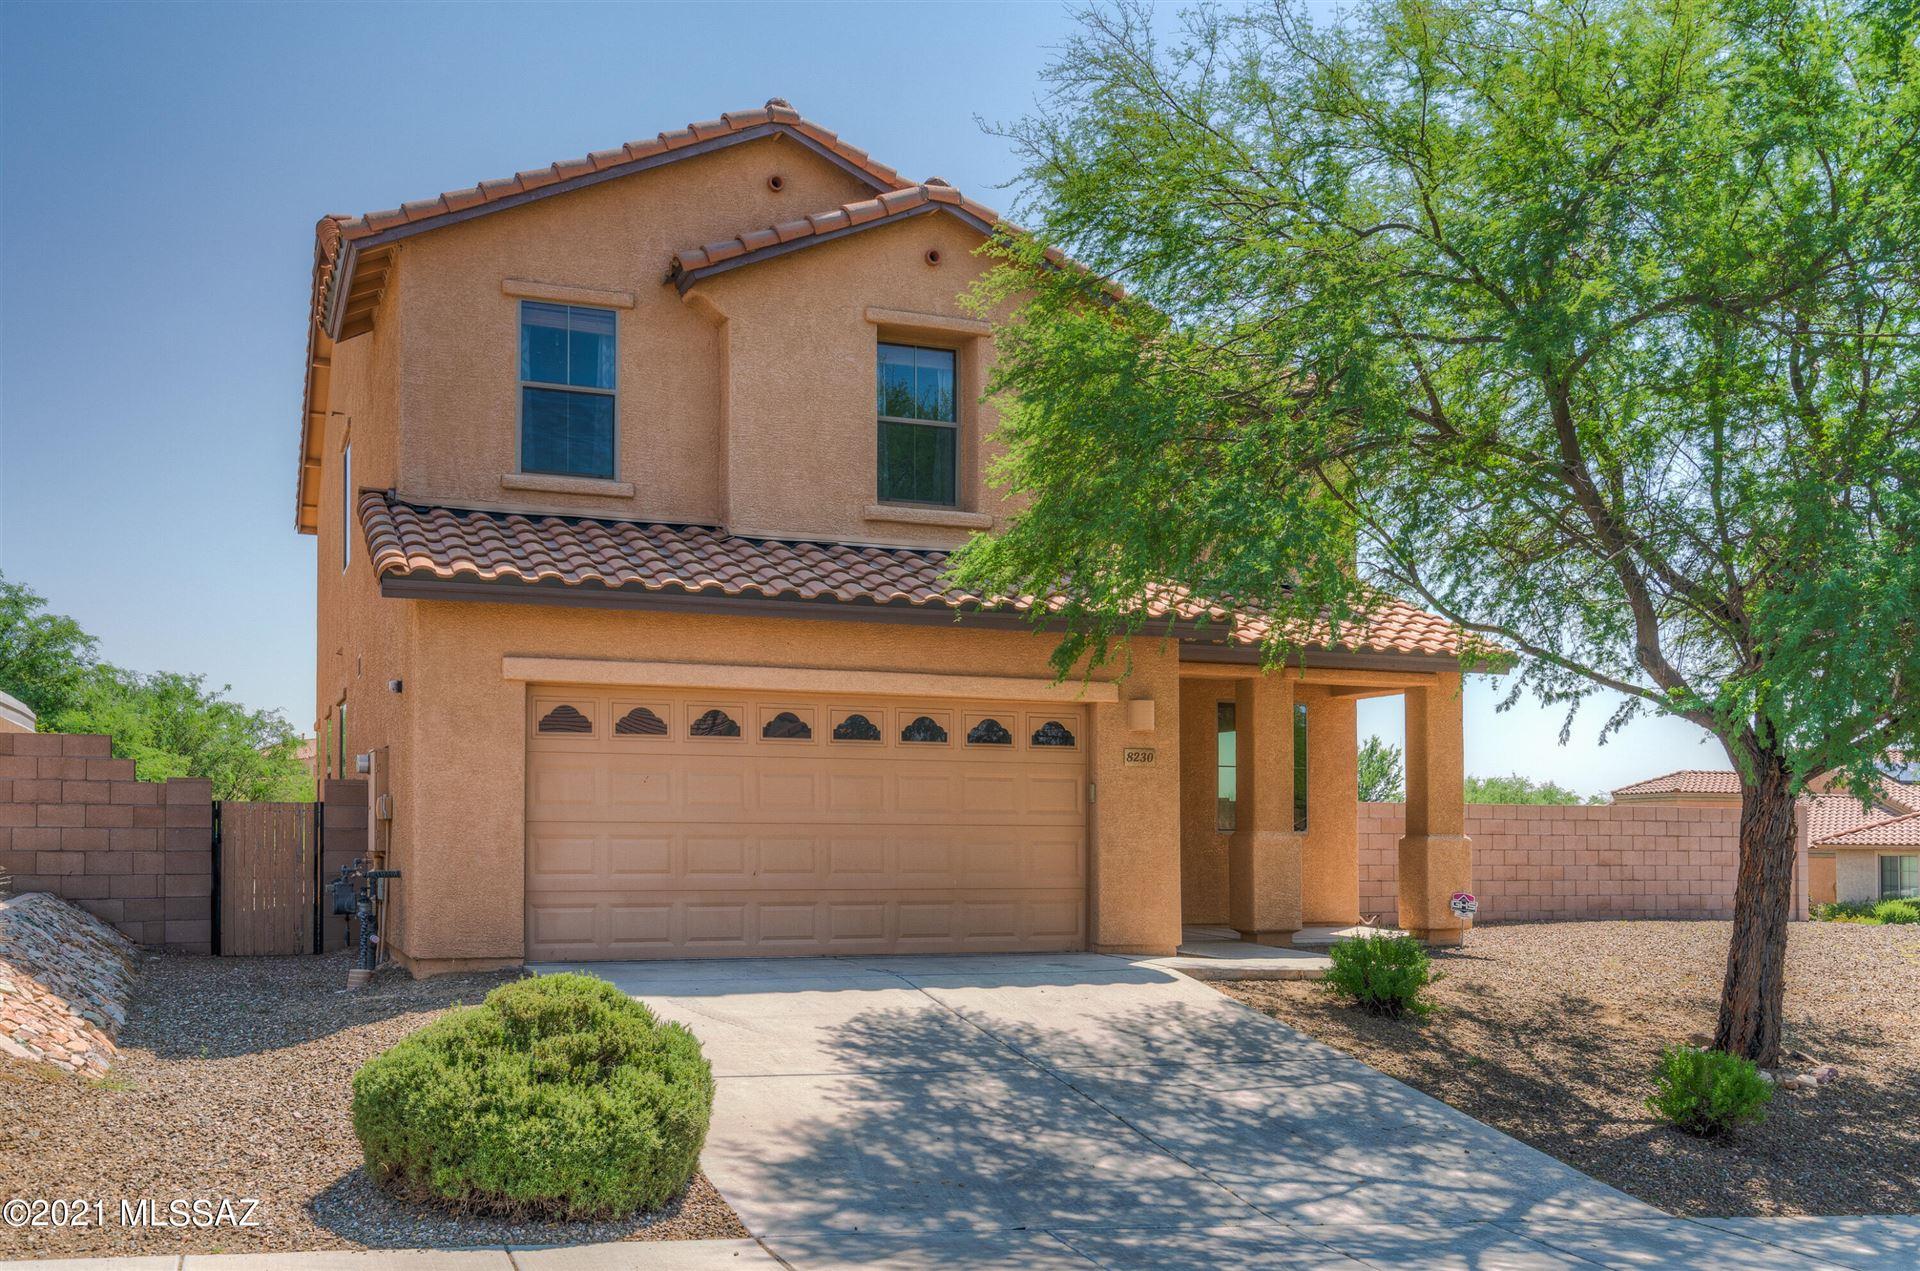 8230 N Winding Willow Way, Tucson, AZ 85742 - MLS#: 22124141